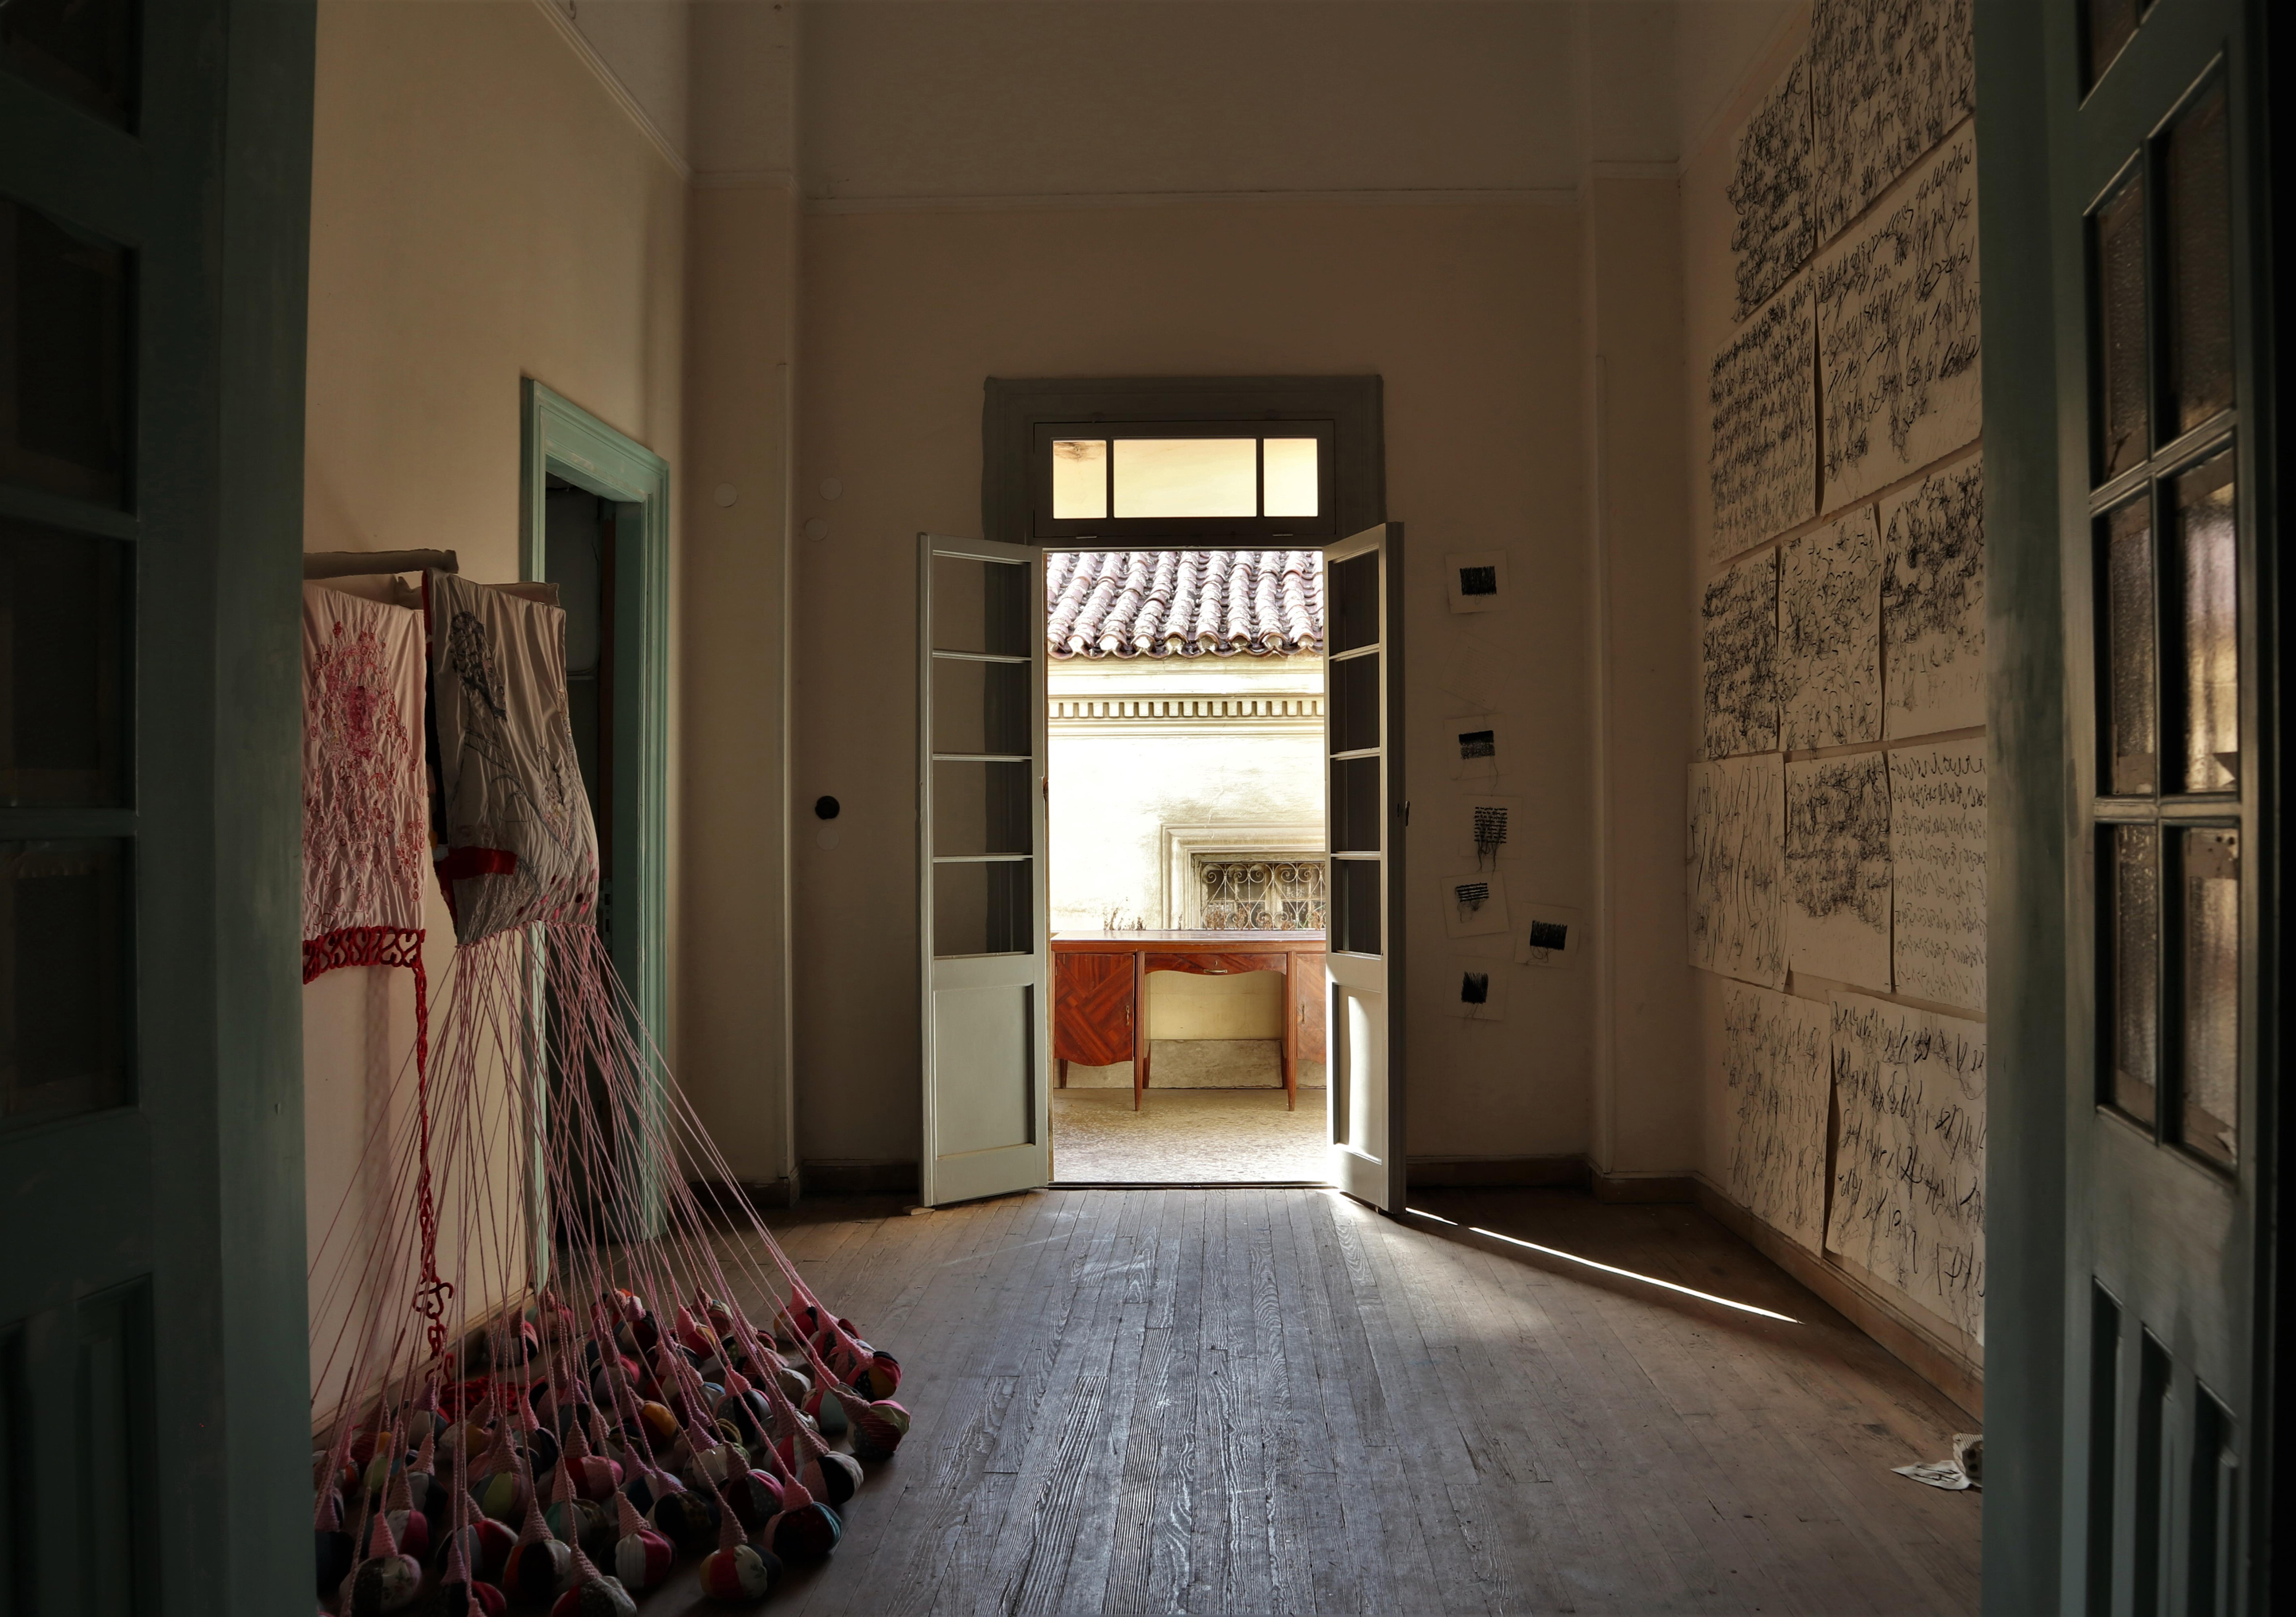 Vana Ntatsouli | Penny Gheka | [un]known destinations chapter III: reconnection ---a second chance | kypseli | athens | 2019 | curator + concept design Kostas Prapoglou ©